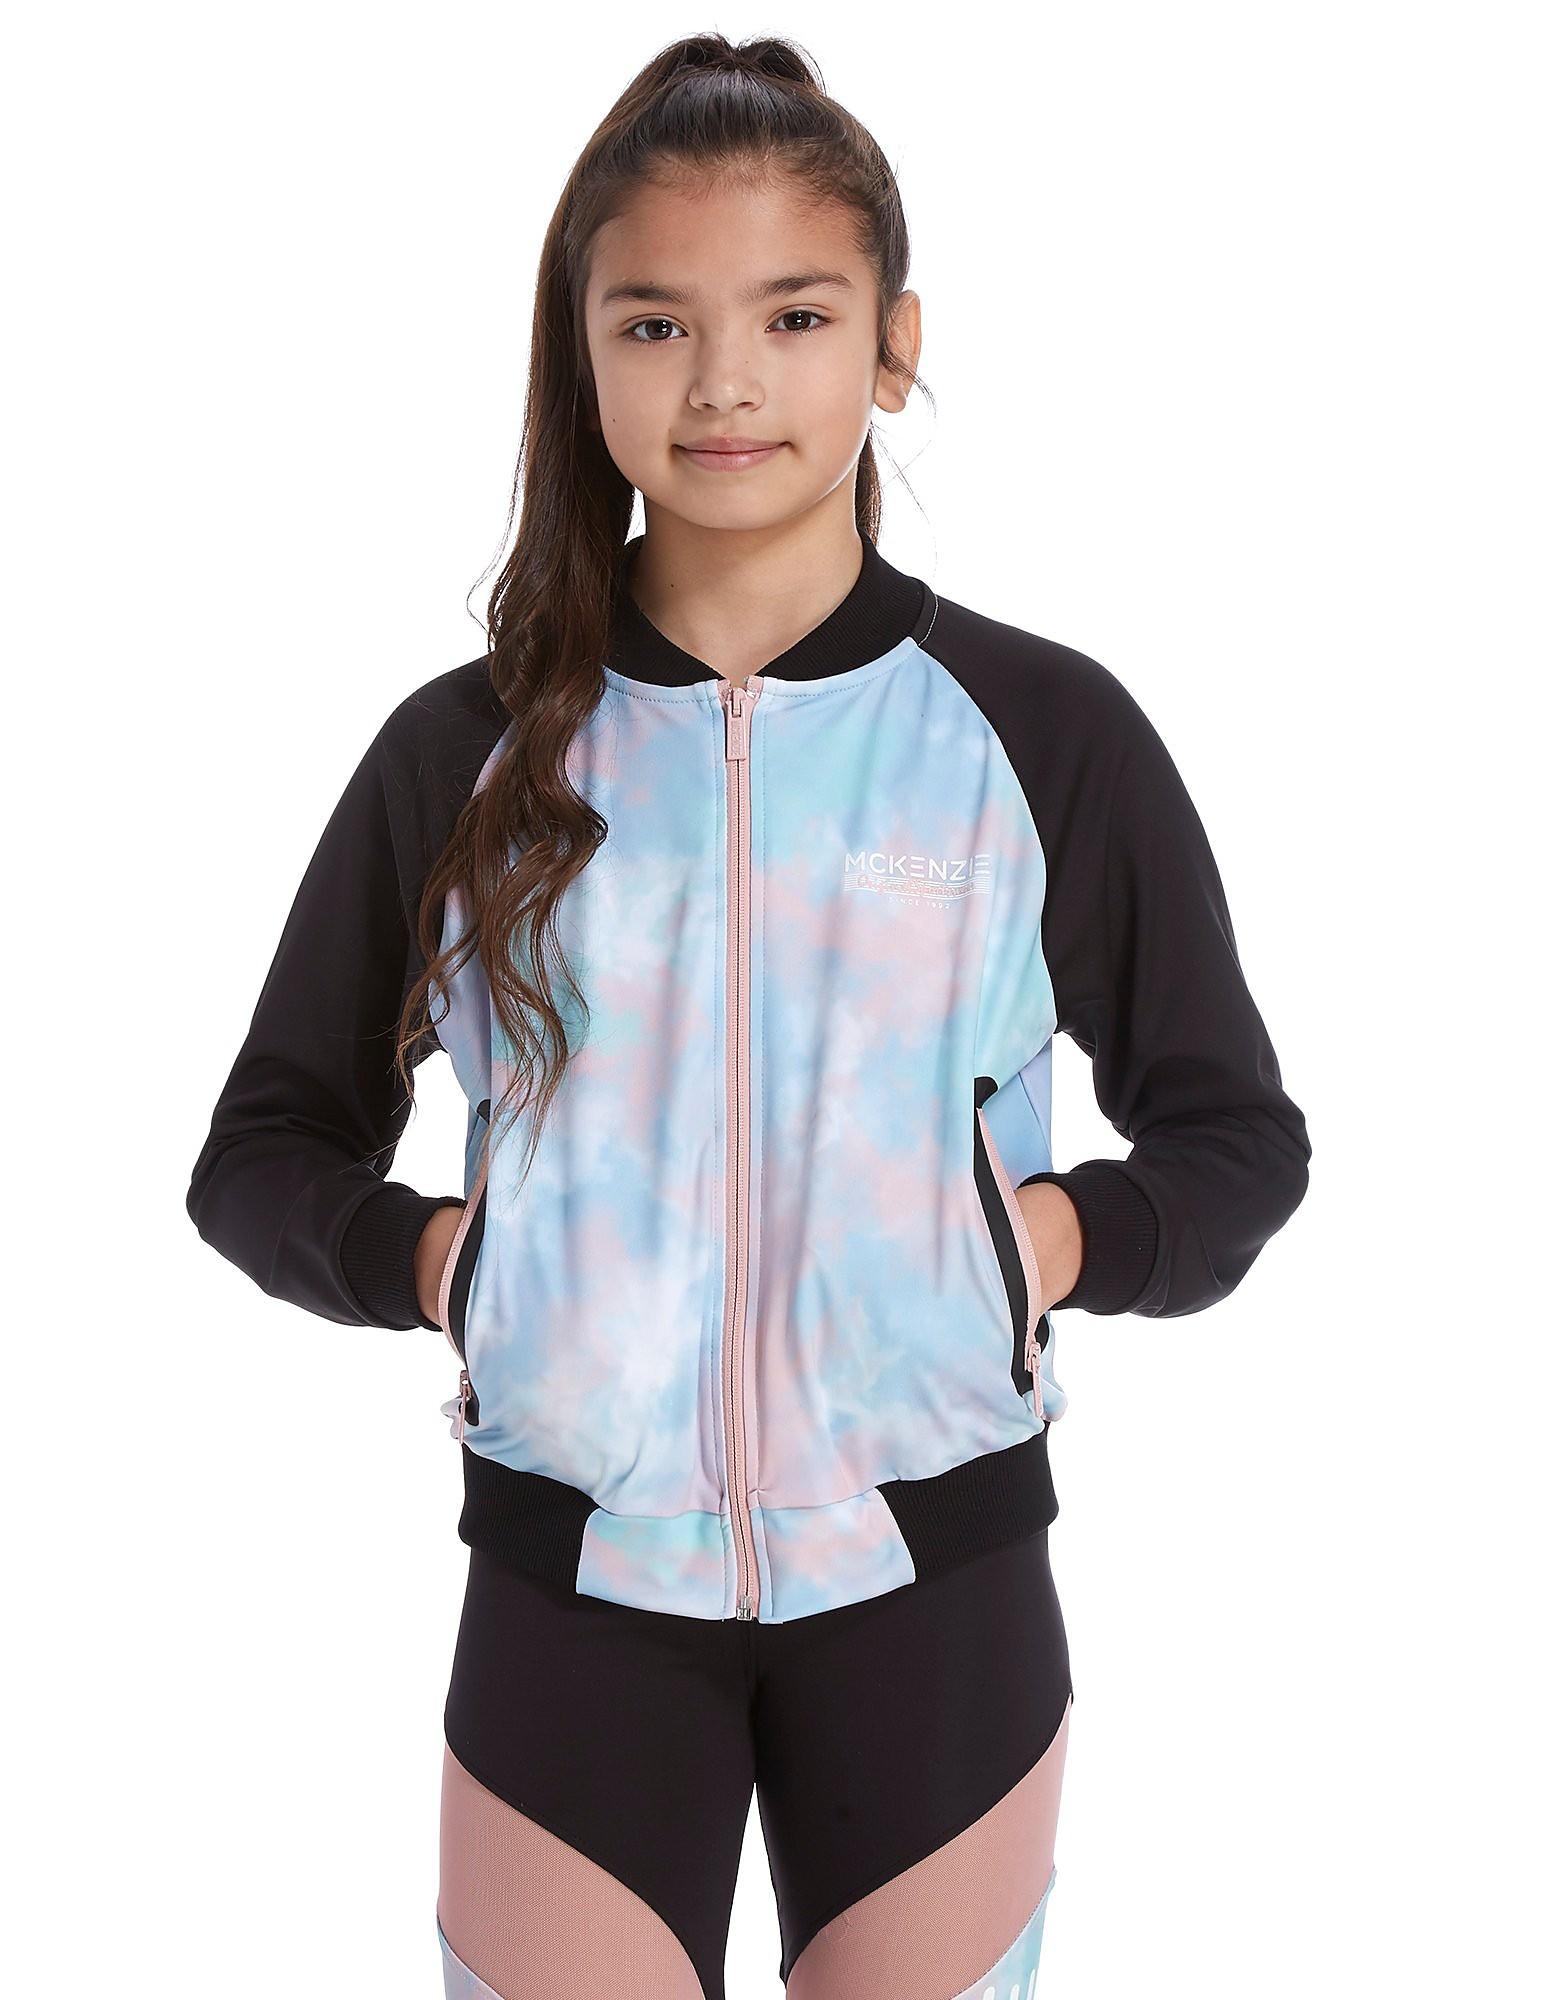 McKenzie Girls' Dylan Tri Bomber Jacket Junior - alleen bij JD - Roze - Kind